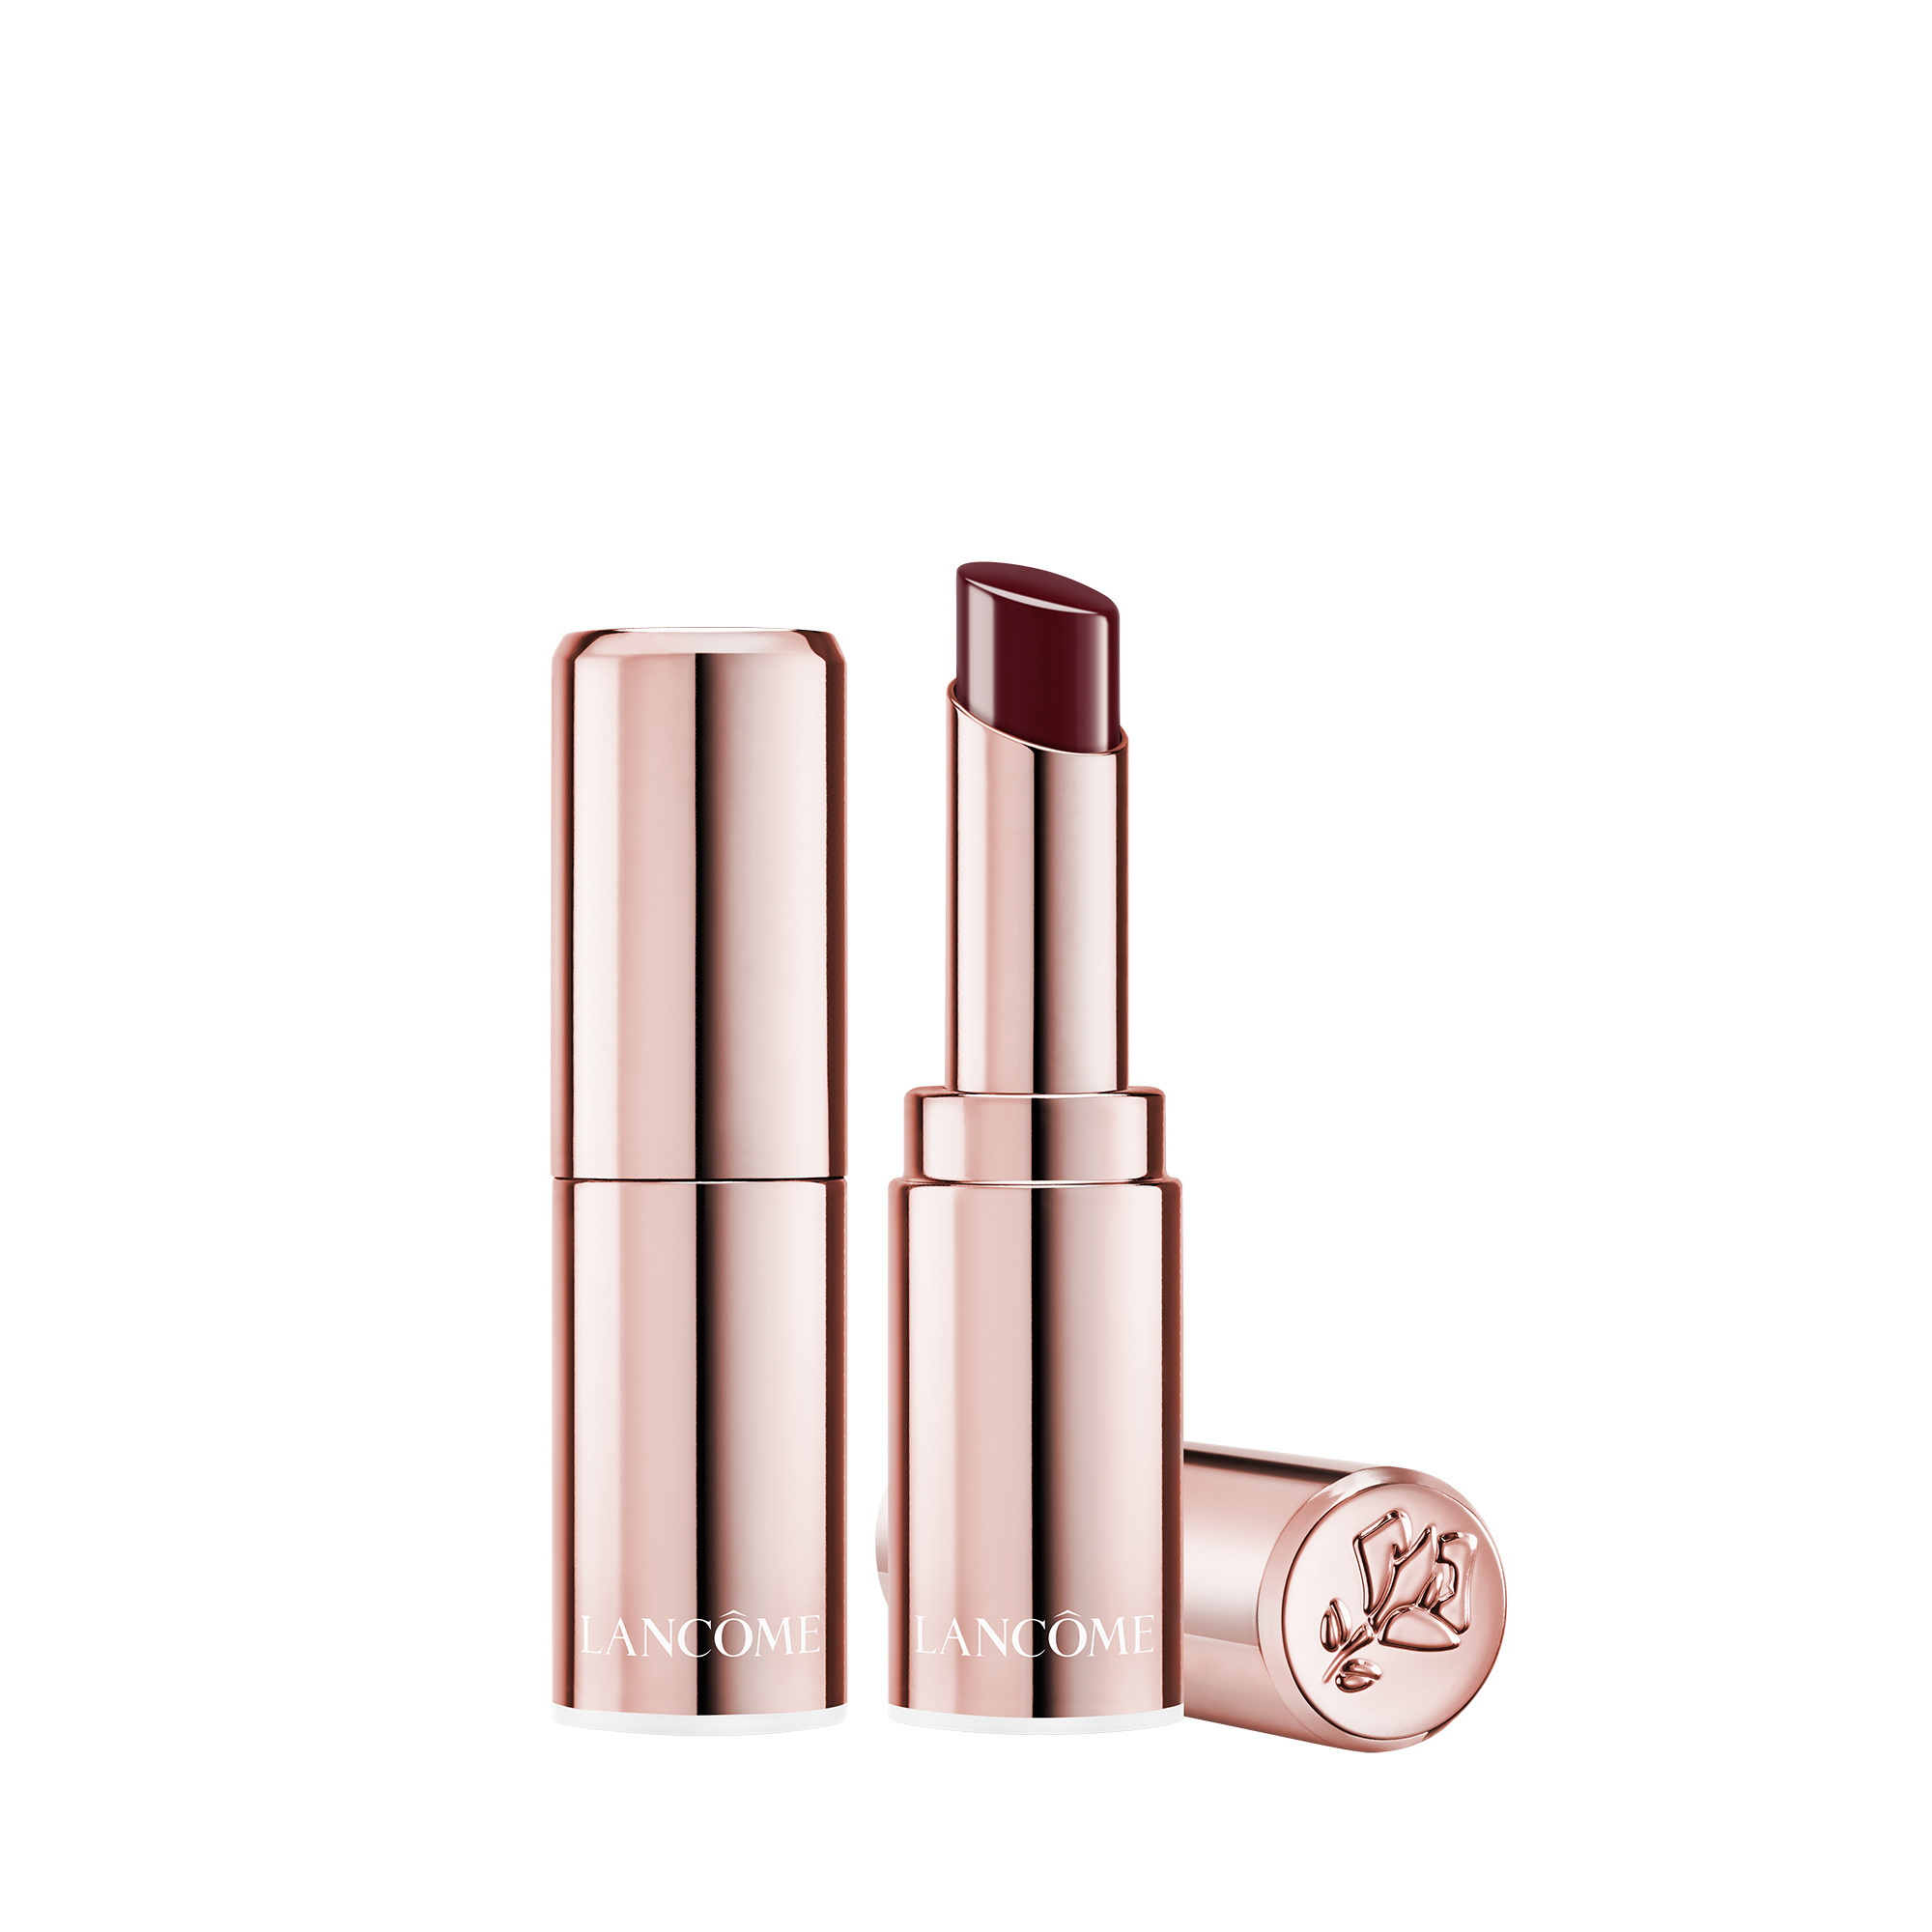 An image of Lancôme L'Absolu Mademoiselle Shine Lipstick - 397 CALL ME SHINY